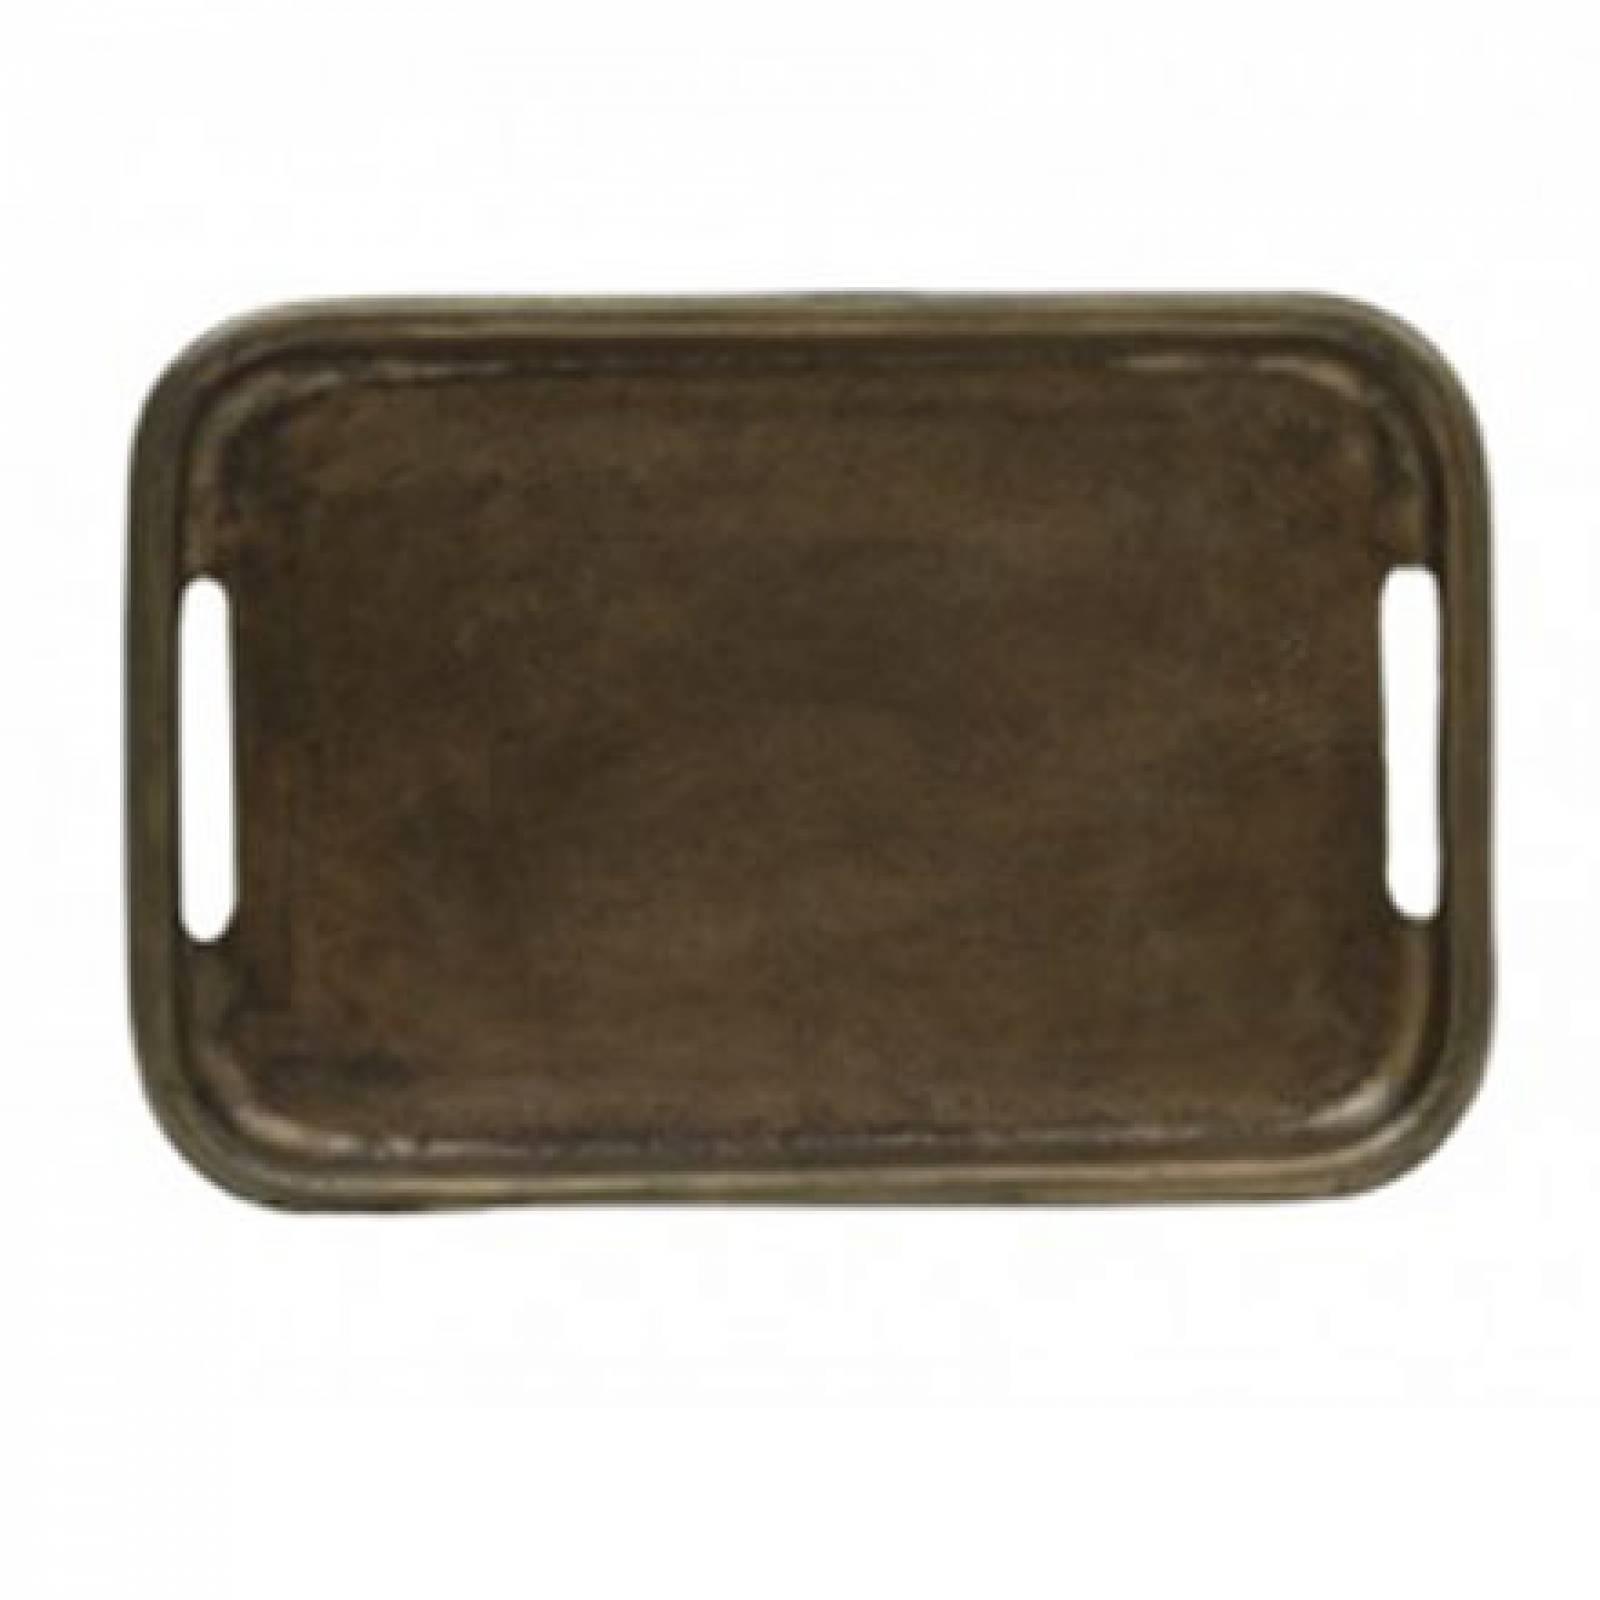 Antiqued Bronzed Tray 30x20cm thumbnails